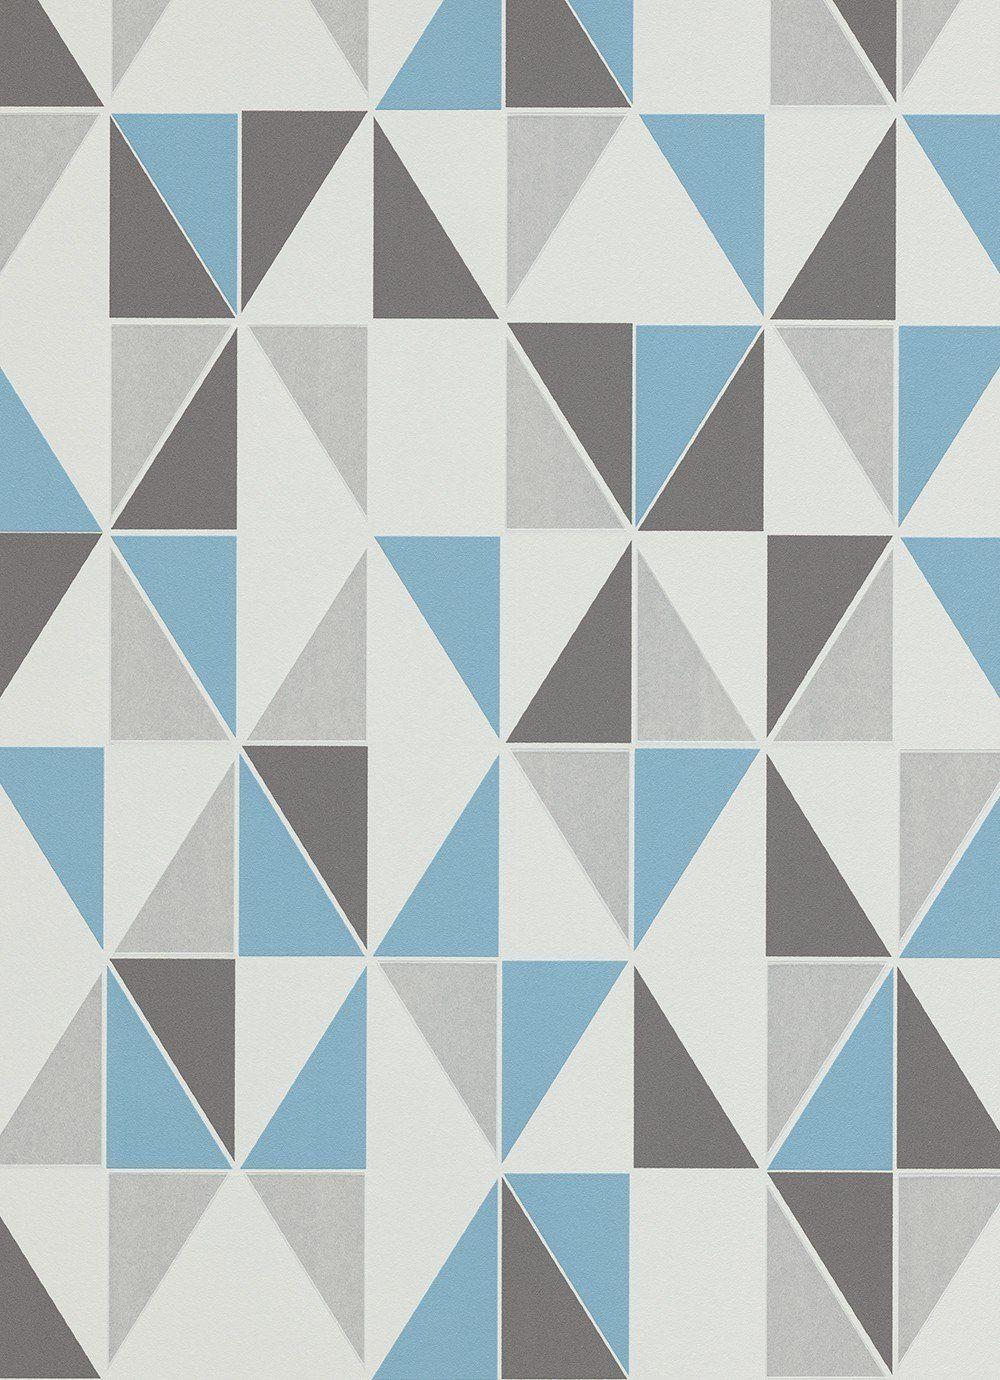 Vliestapete Design Kariert Blau Grau Tapete Erismann Make Up 2 6925